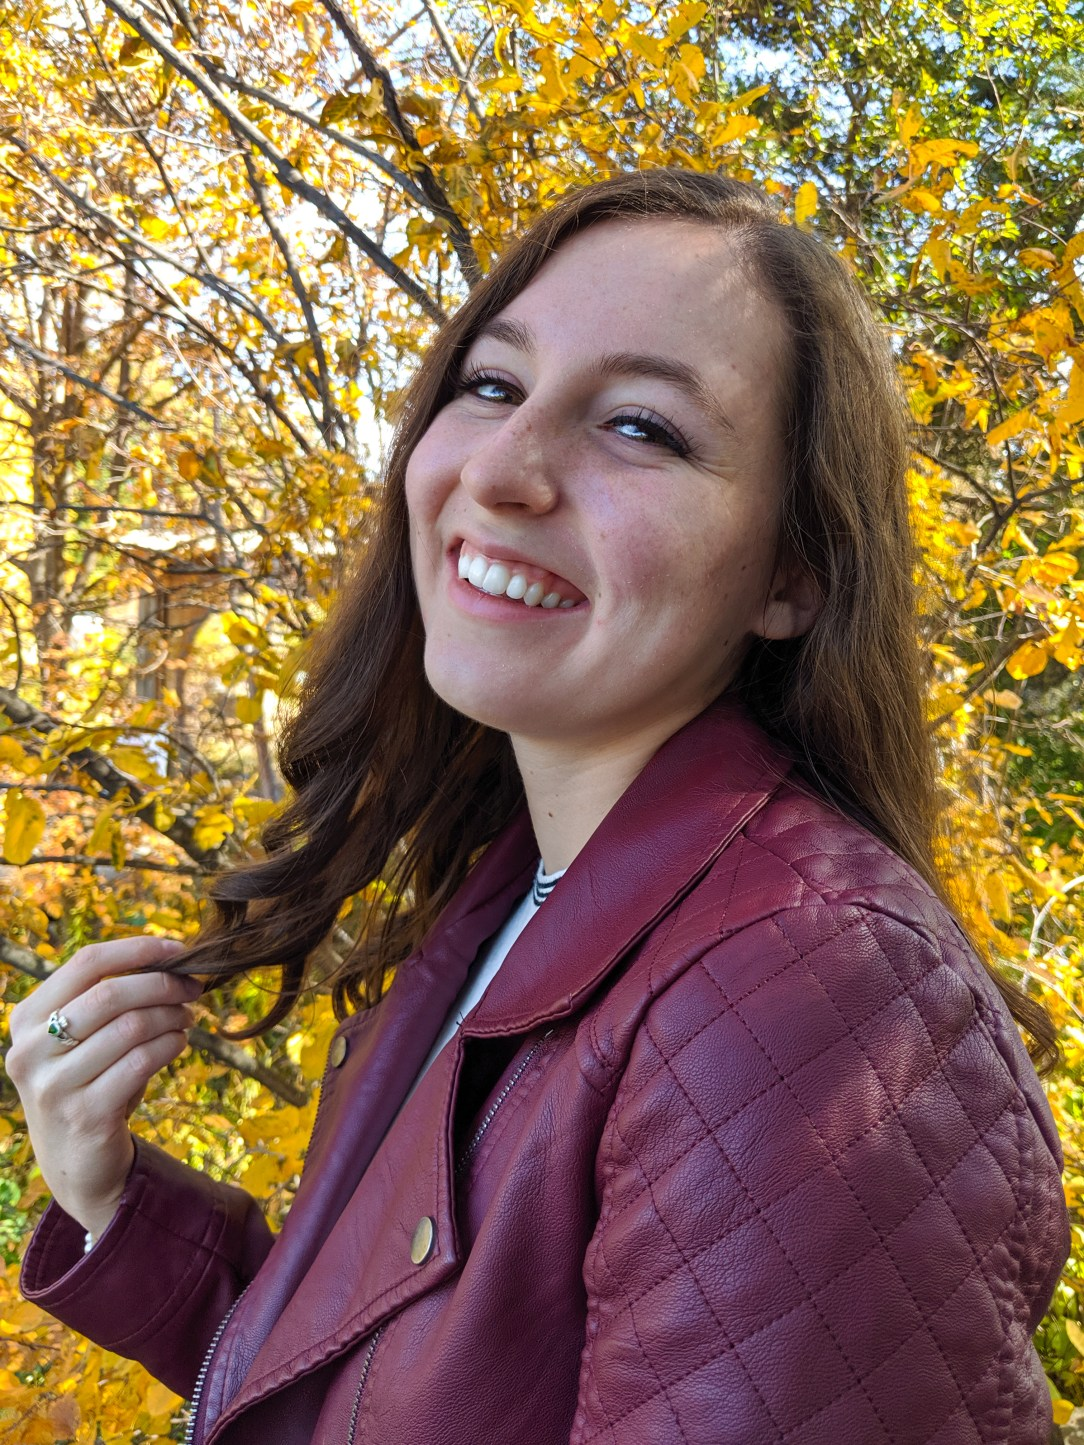 fall outfit, burgundy jacket, black eyeliner